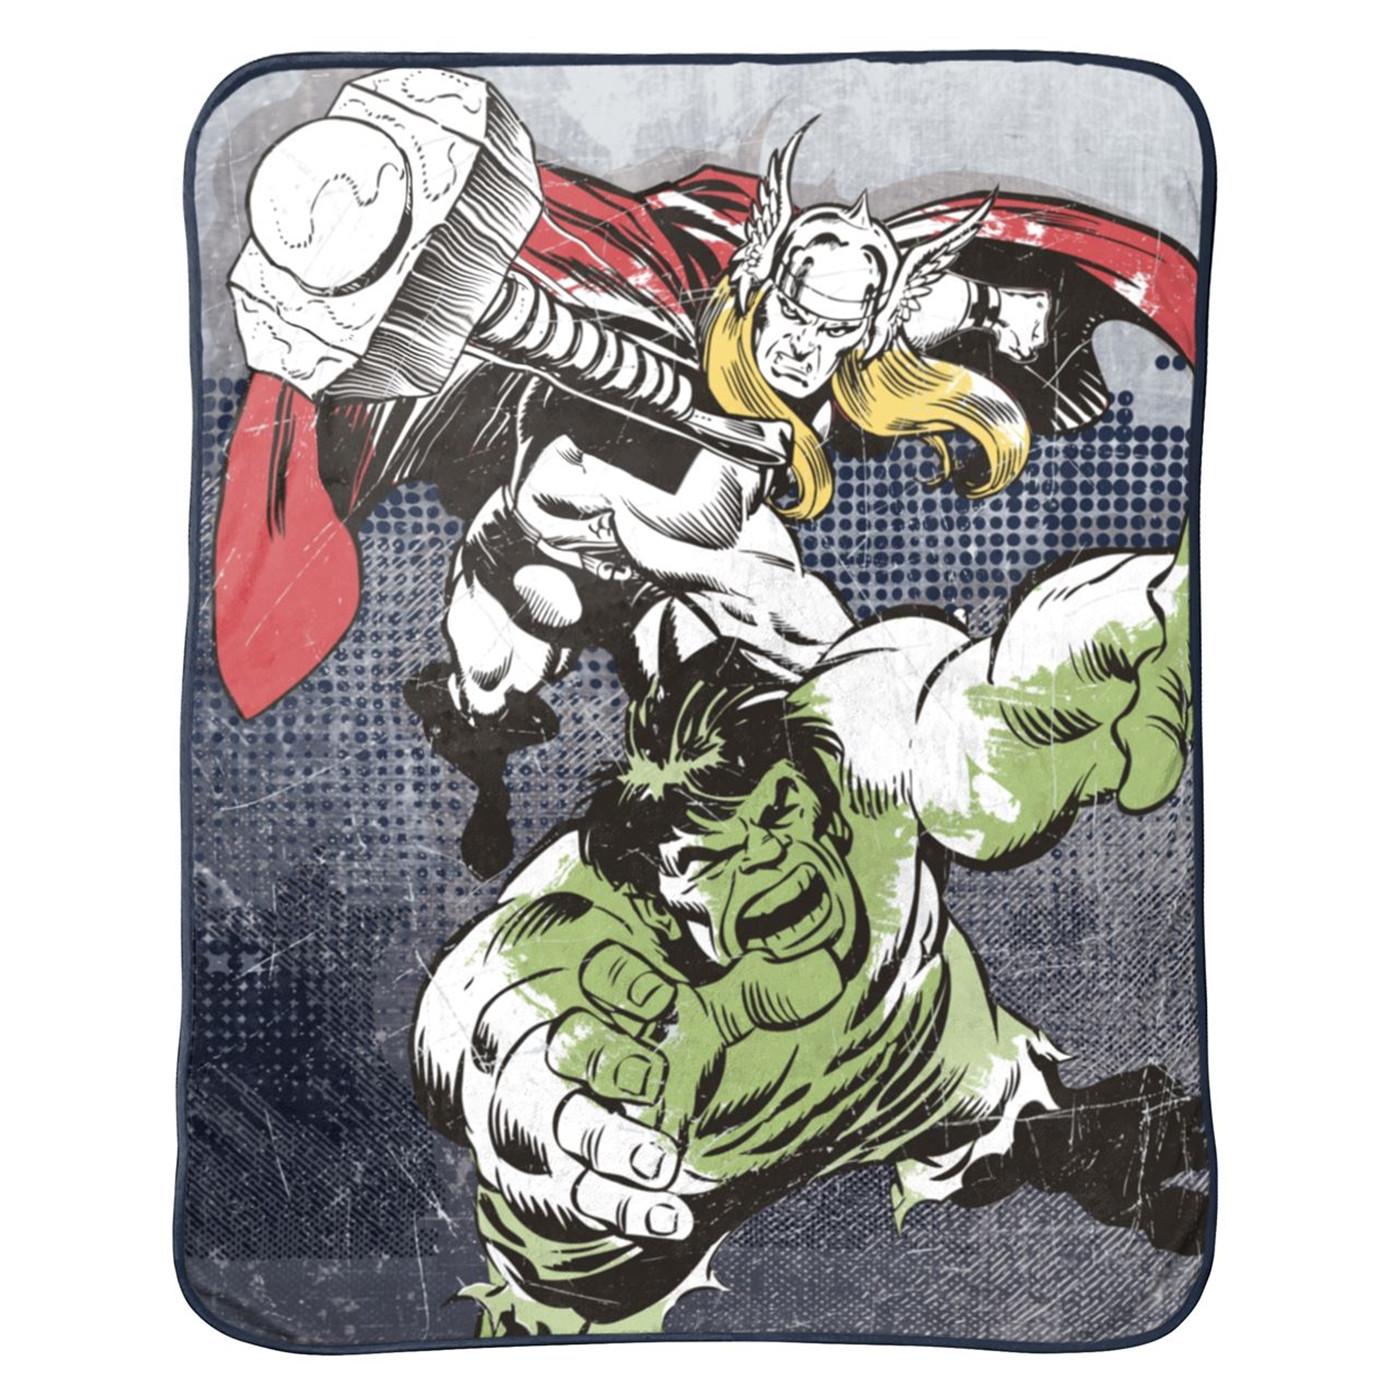 Thor and Hulk Throw